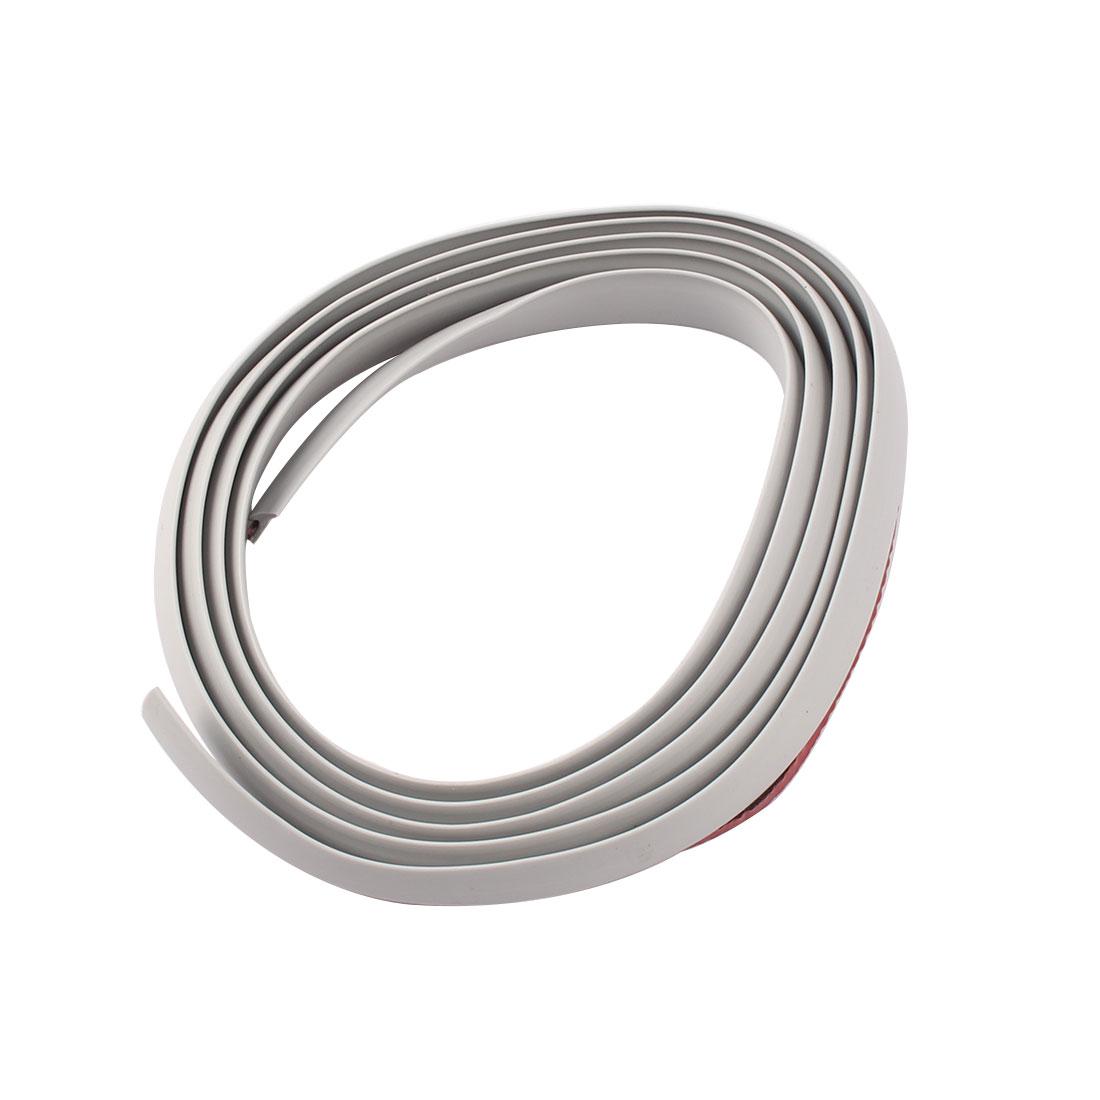 Car Auto Door Edge Guard Trim Decoration Protection Strip Gray 1.6M Length